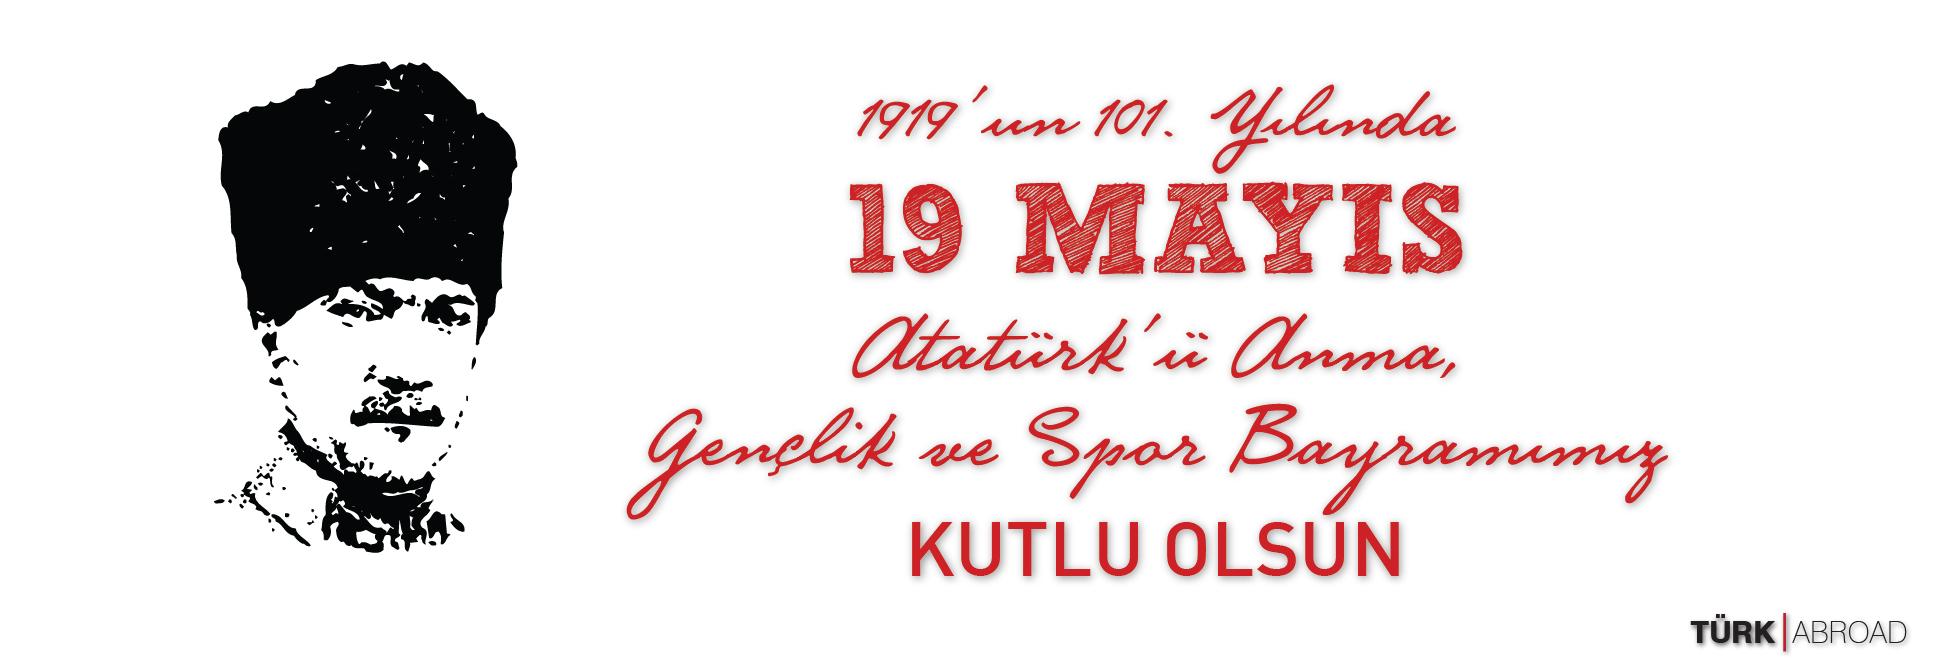 19-mayis-turkabroad2